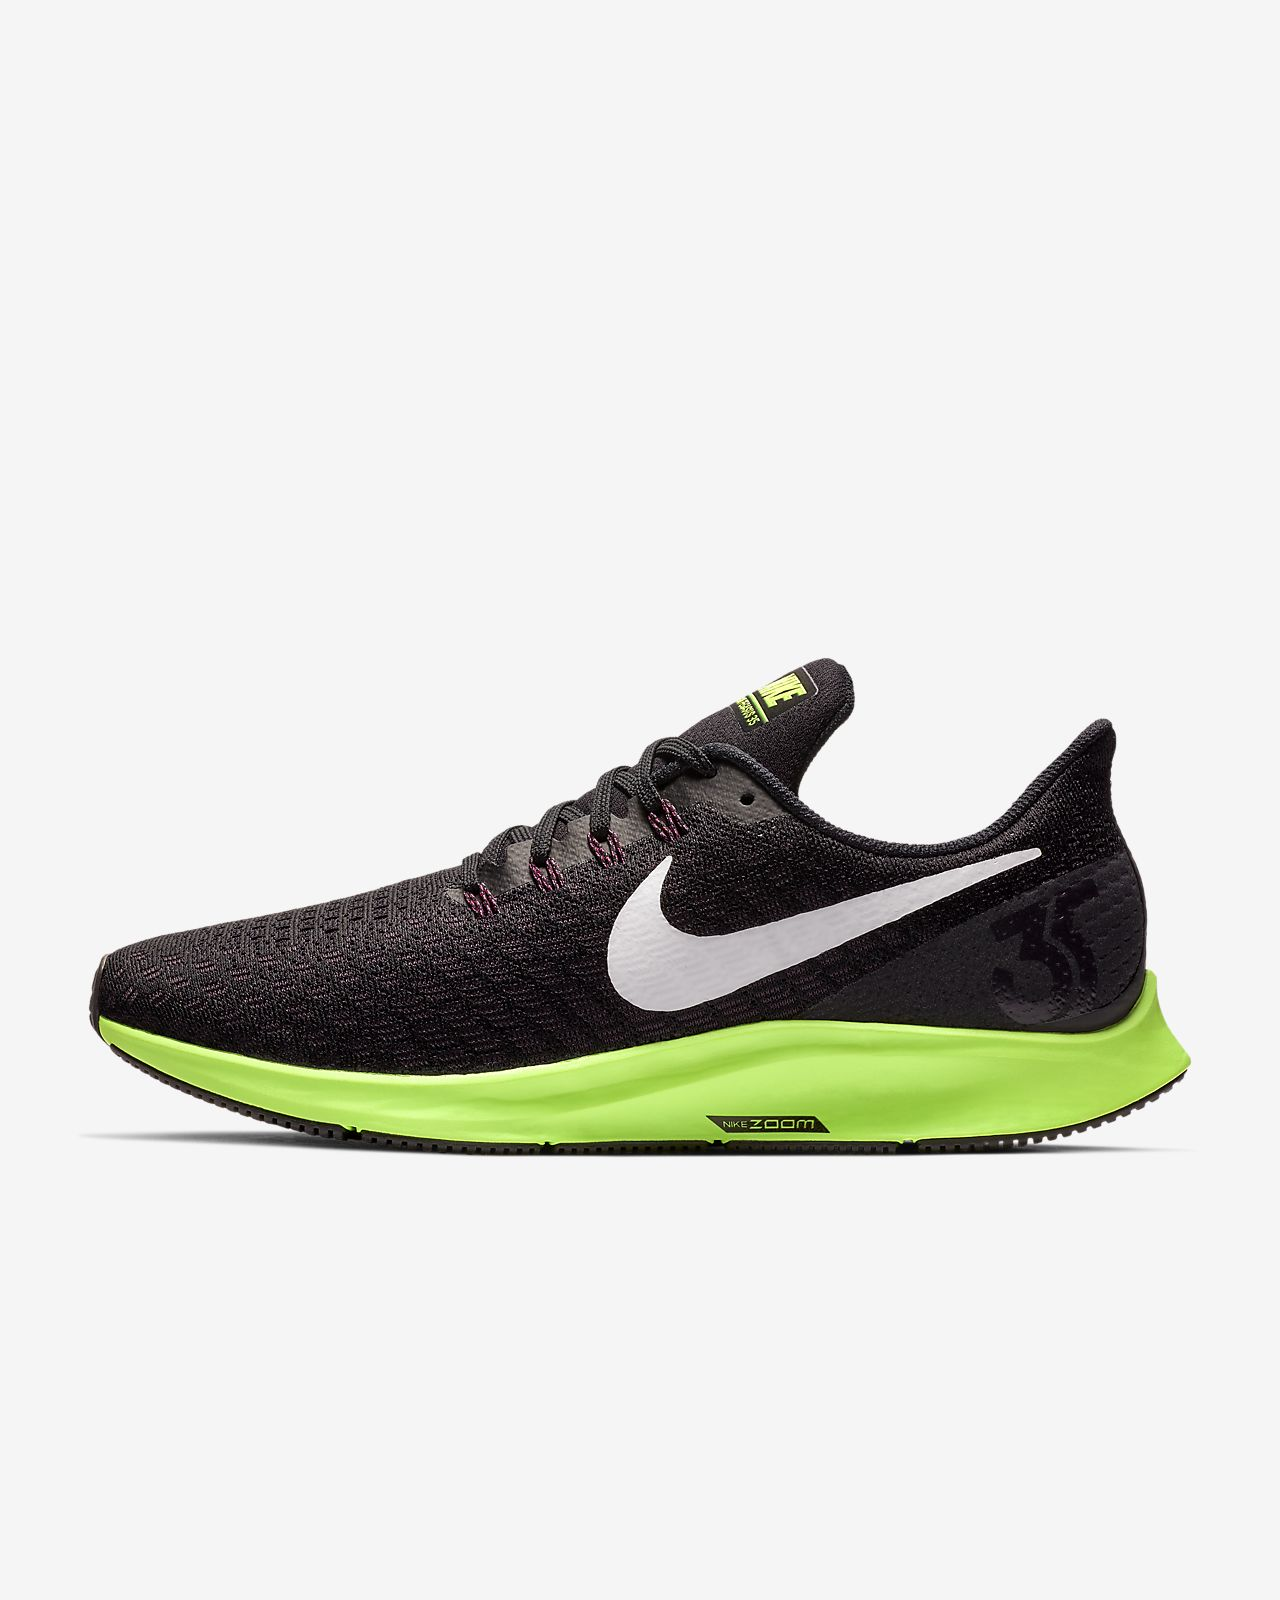 huge selection of 4ca36 7e090 ... Męskie buty do biegania Nike Air Zoom Pegasus 35